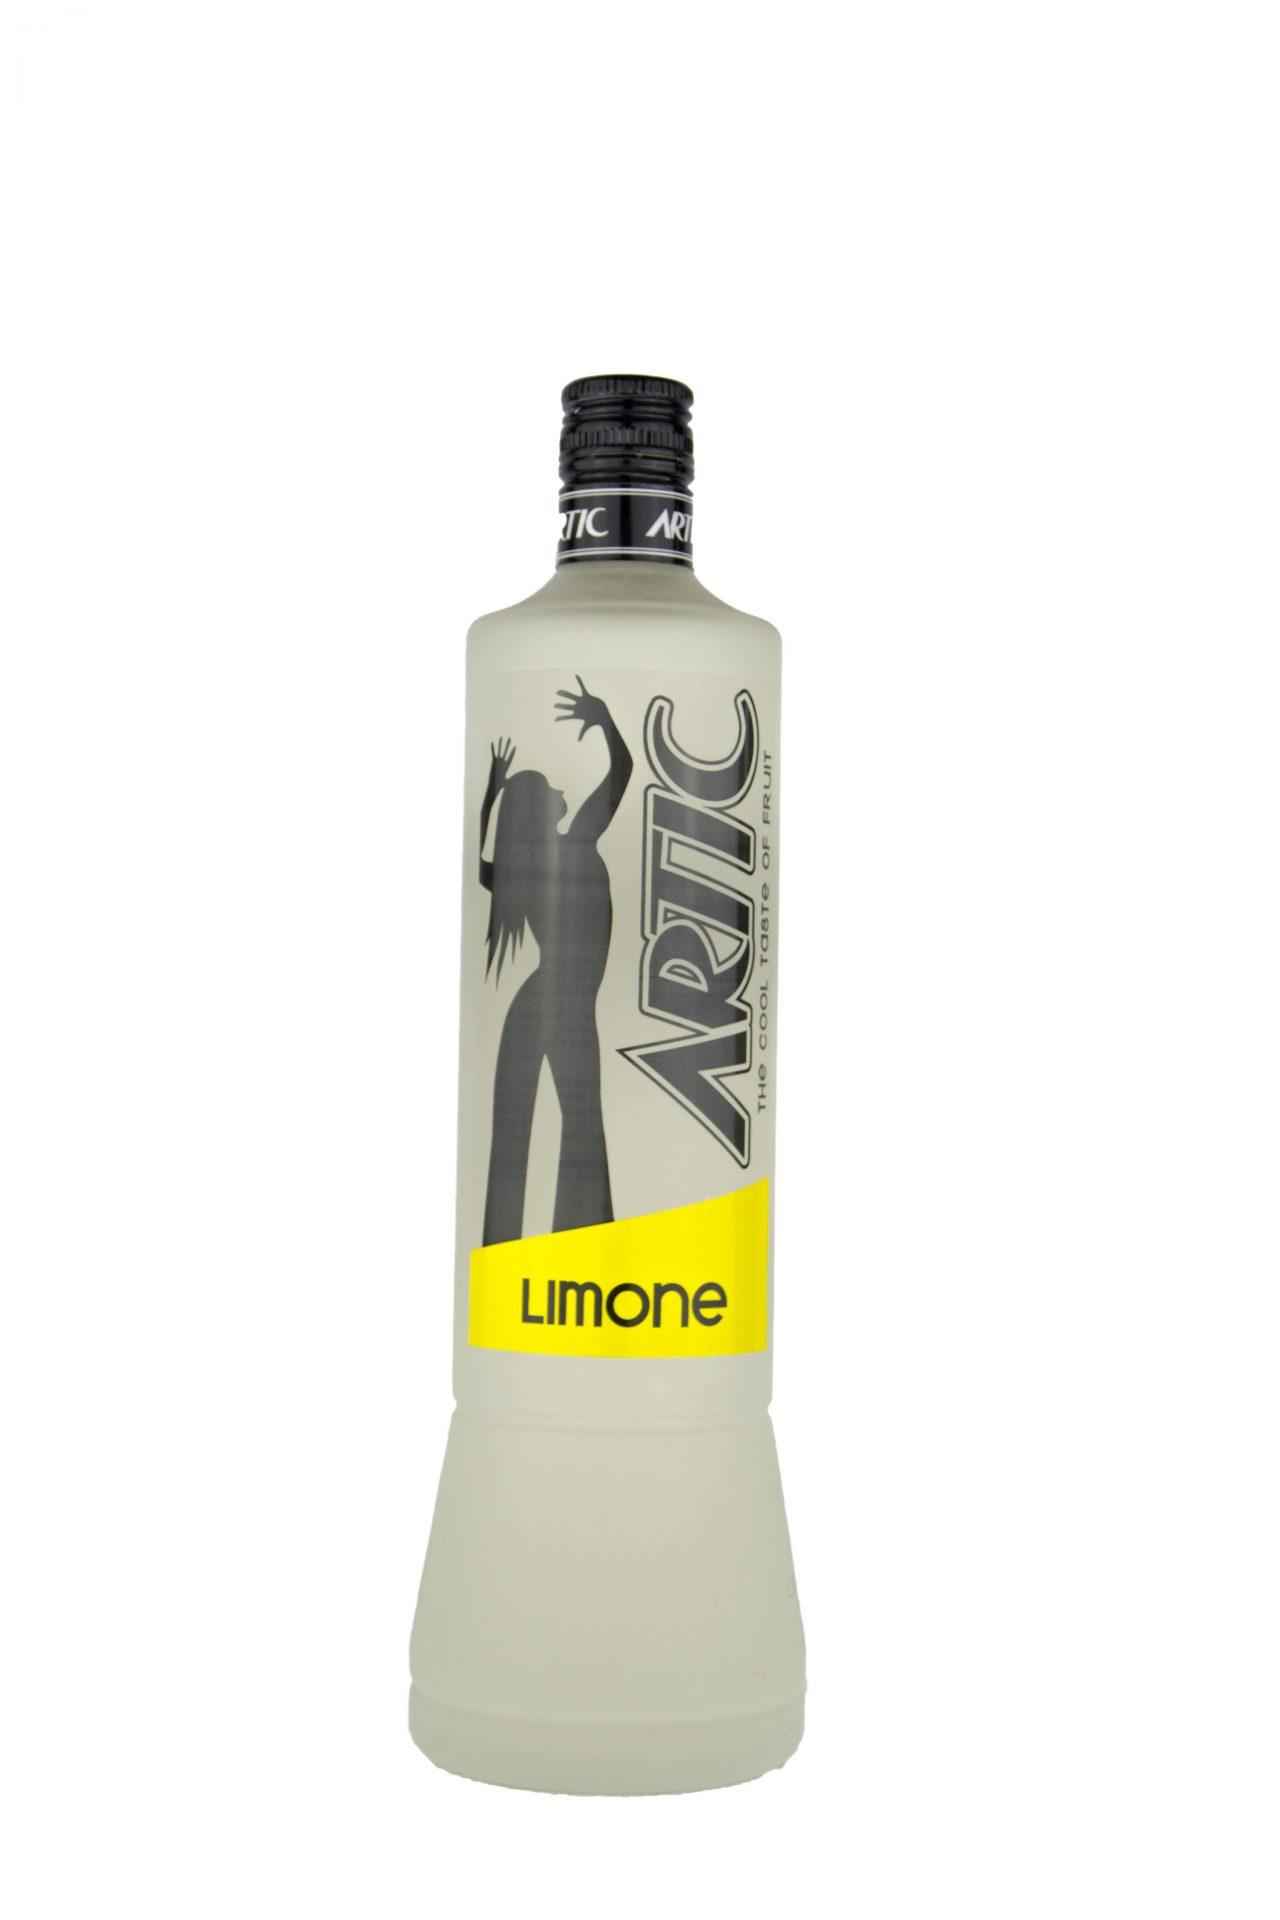 Artic – Vodka & Limone